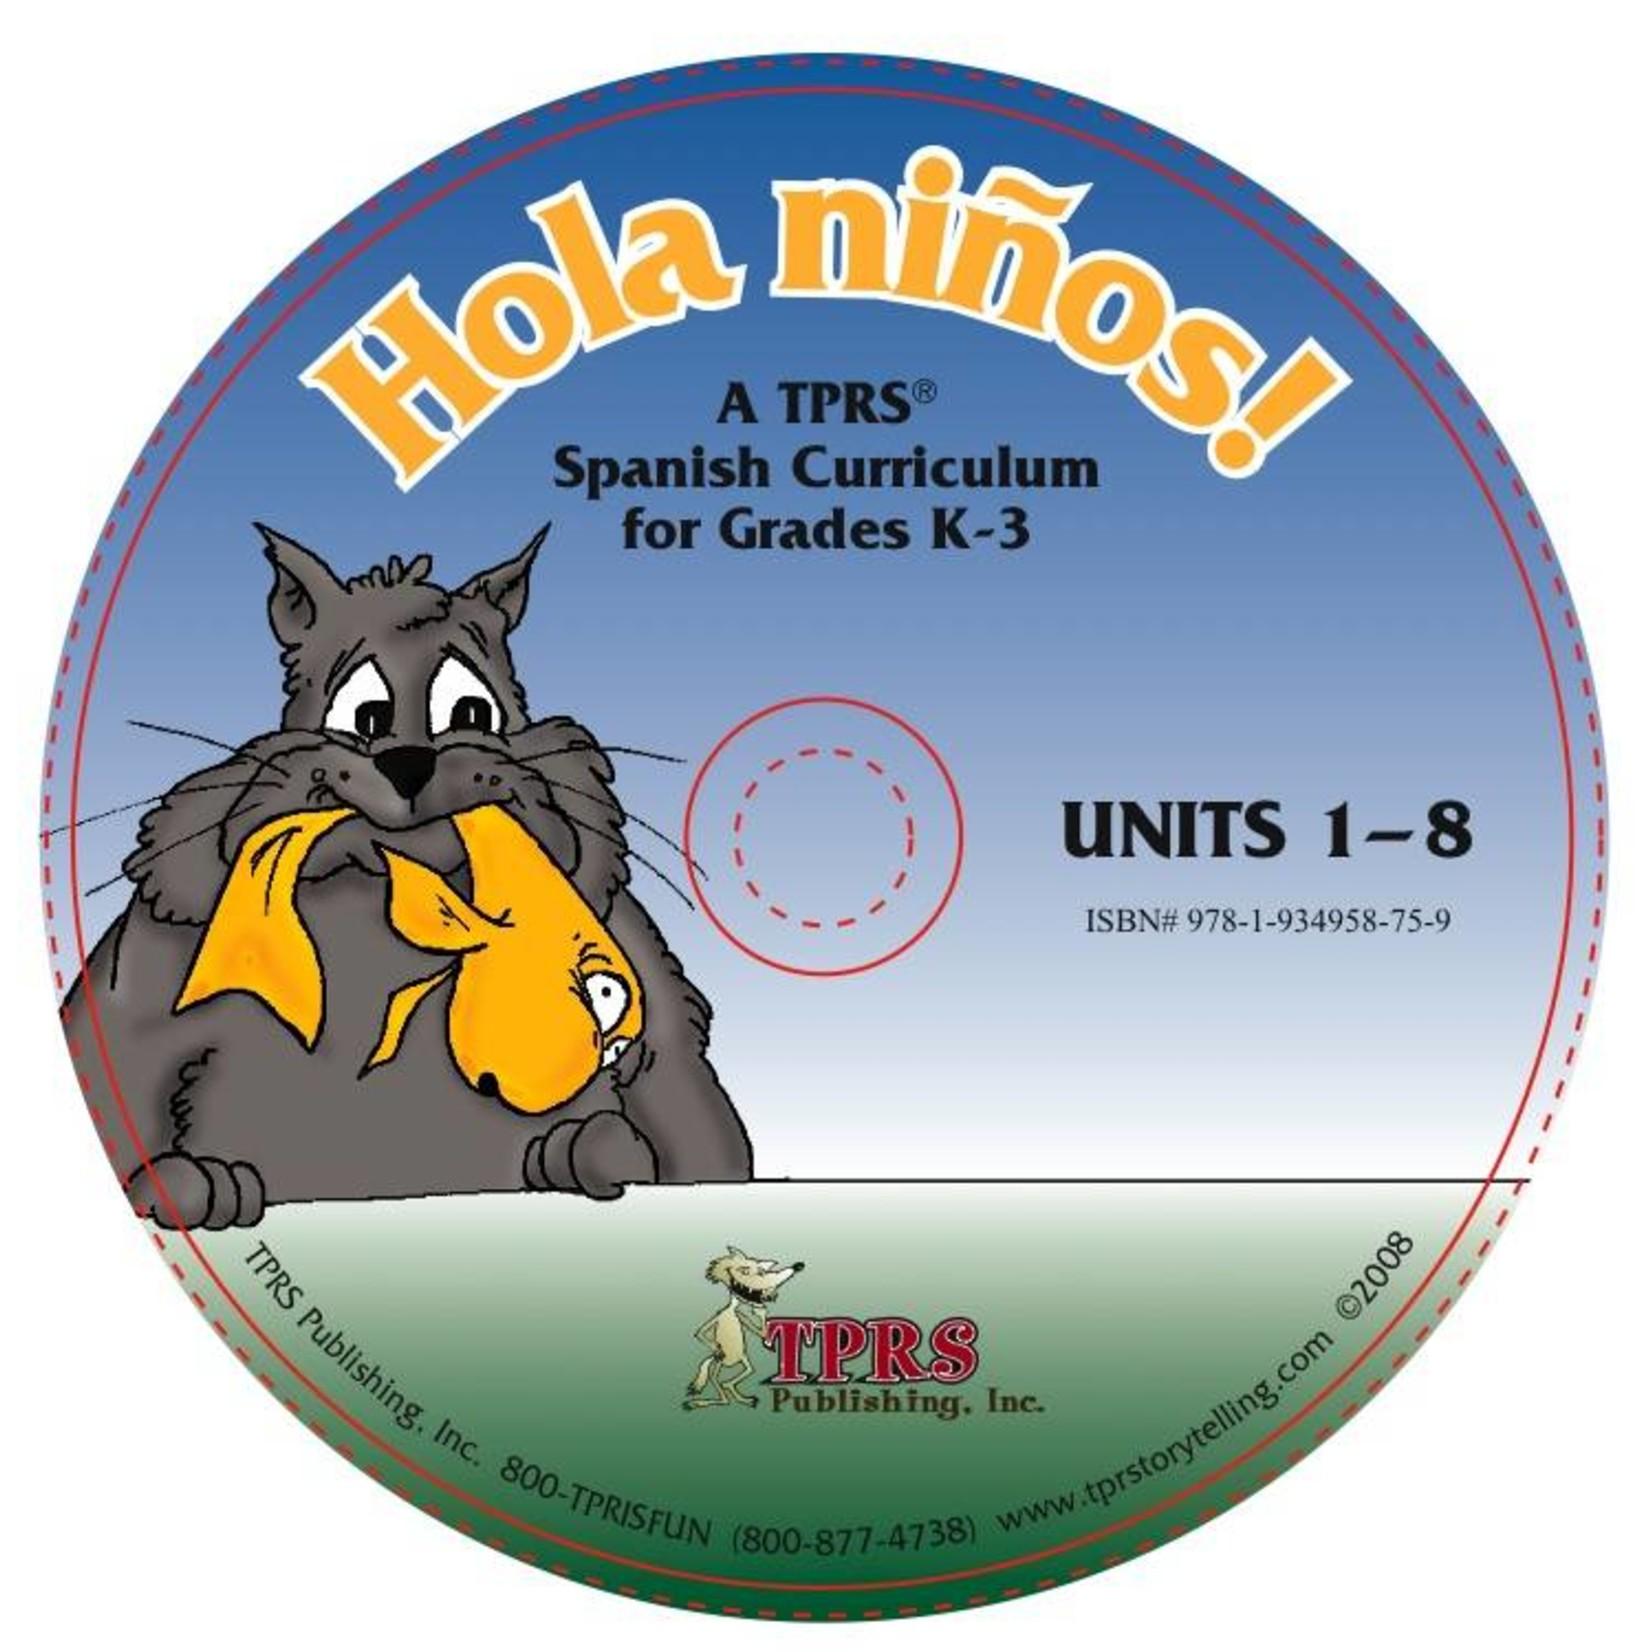 Fluency Matters ¡Hola niños! Units 1-8 on CD